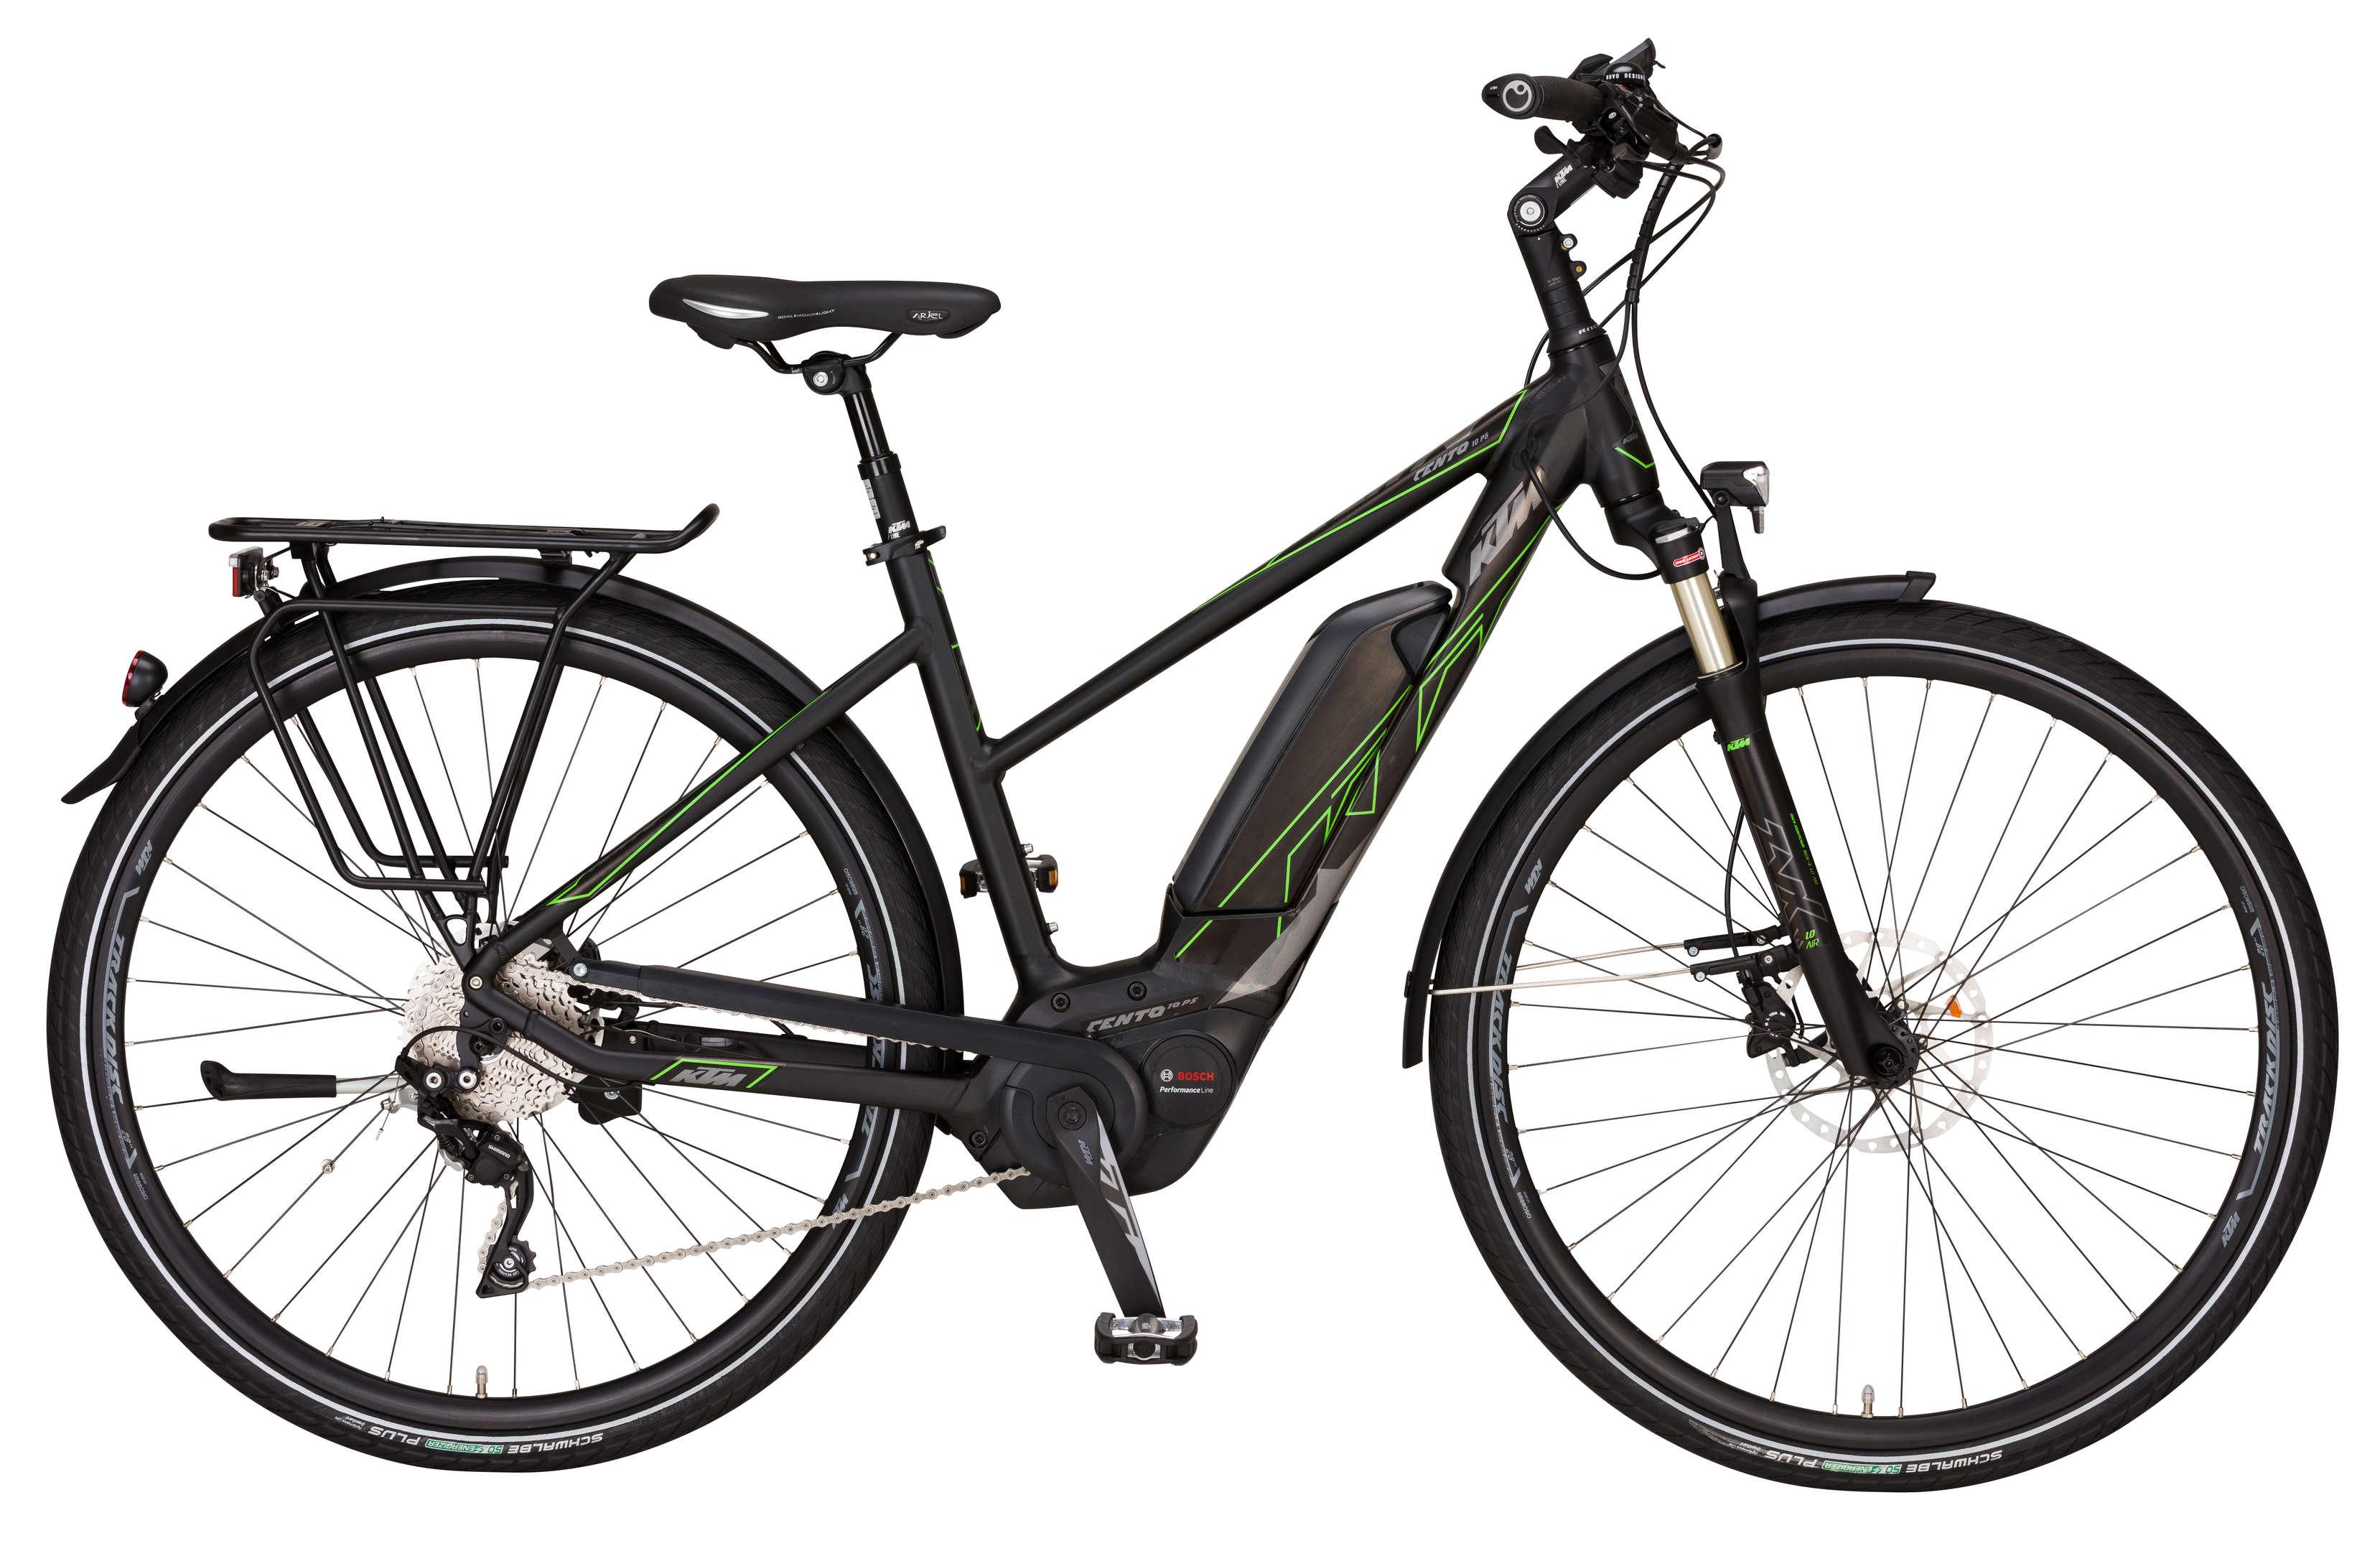 ktm e bike cento plus 10 p5 eurorad bikeleasingeurorad bikeleasing. Black Bedroom Furniture Sets. Home Design Ideas